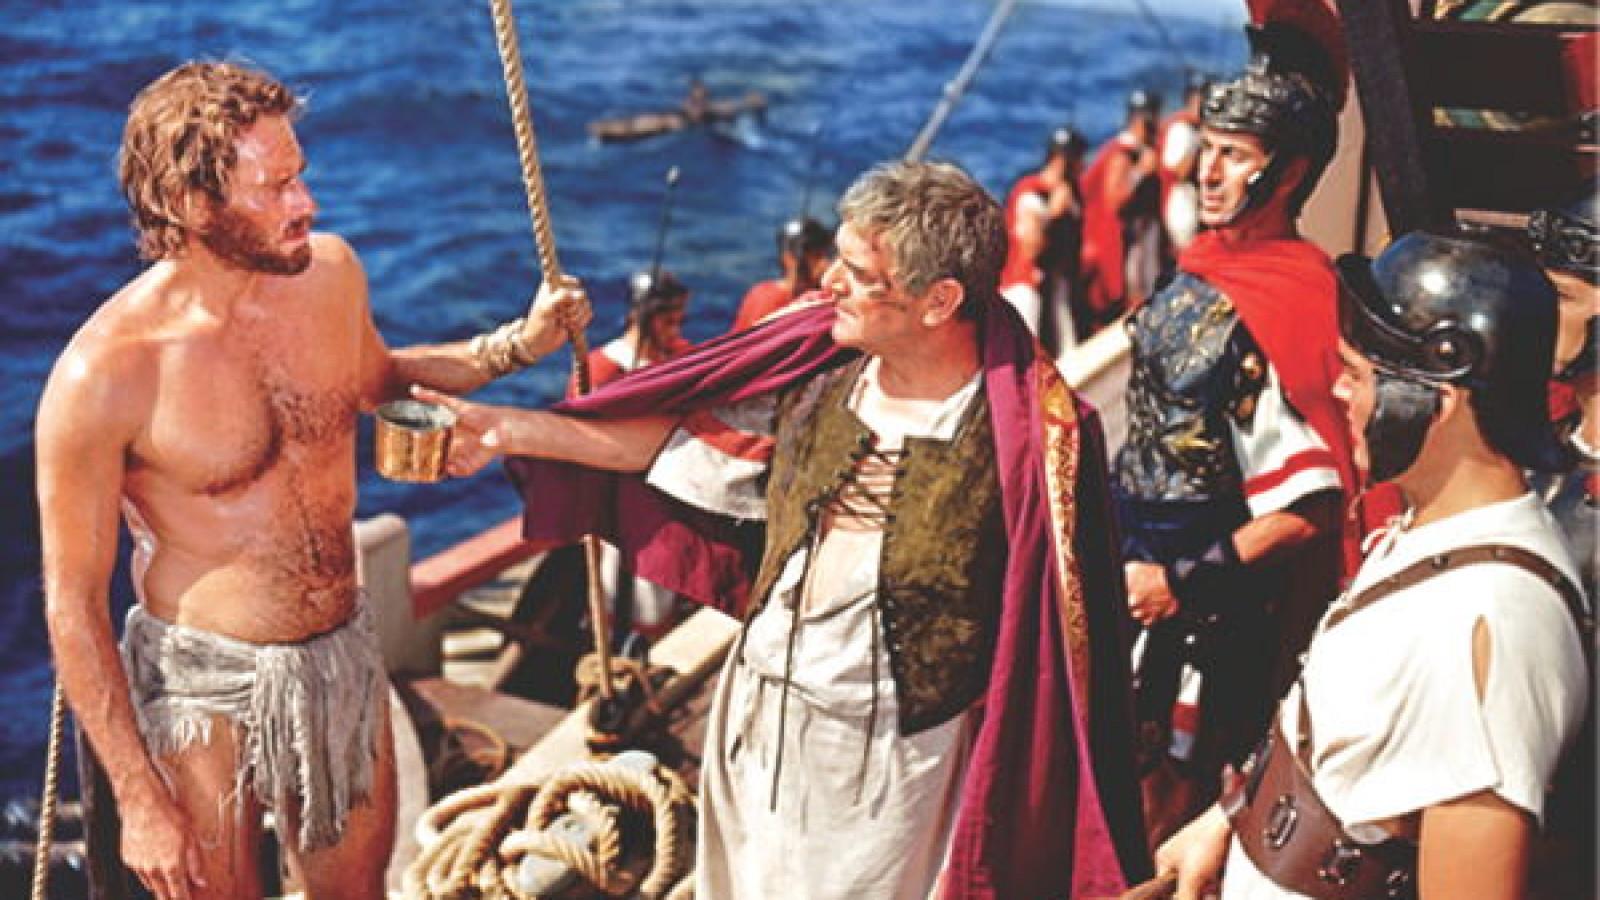 Ben Hur 1959 Charlton Heston shirtless Roman Cosul Rescue